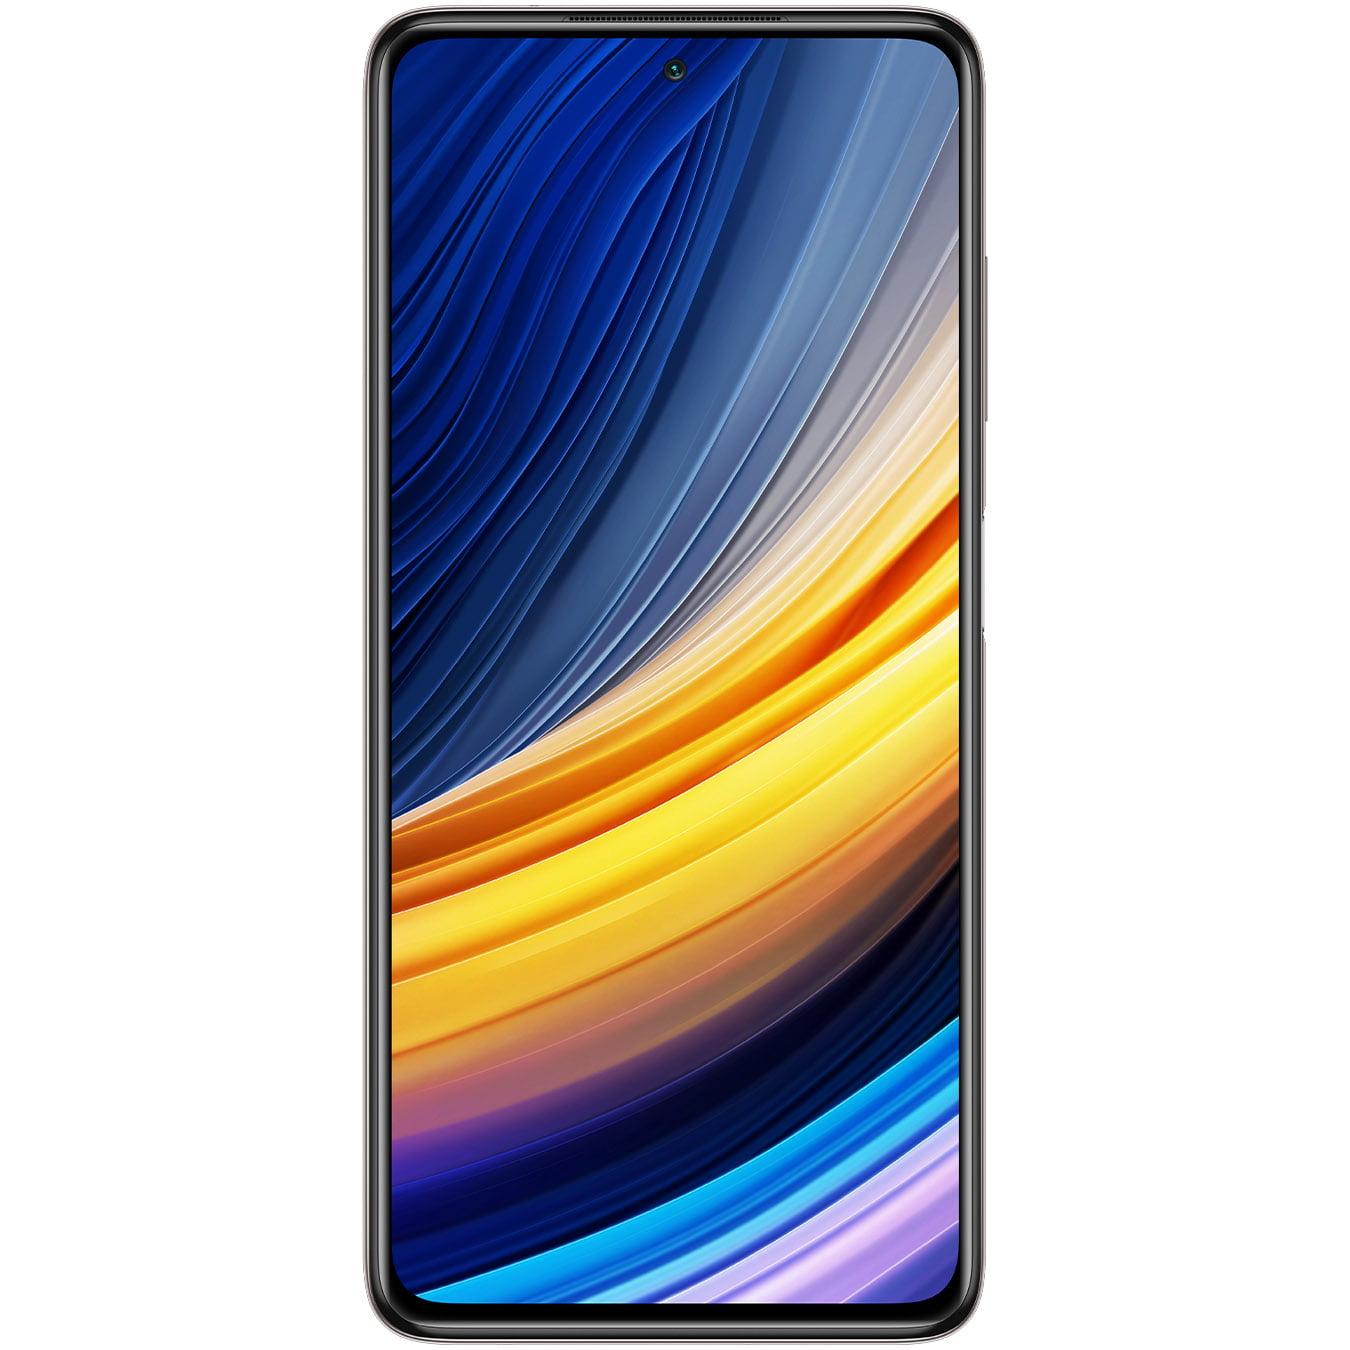 Telefon mobil Xiaomi Poco X3 Pro, Dual SIM, 128GB, 6GB RAM, 4G, Metal Bronze